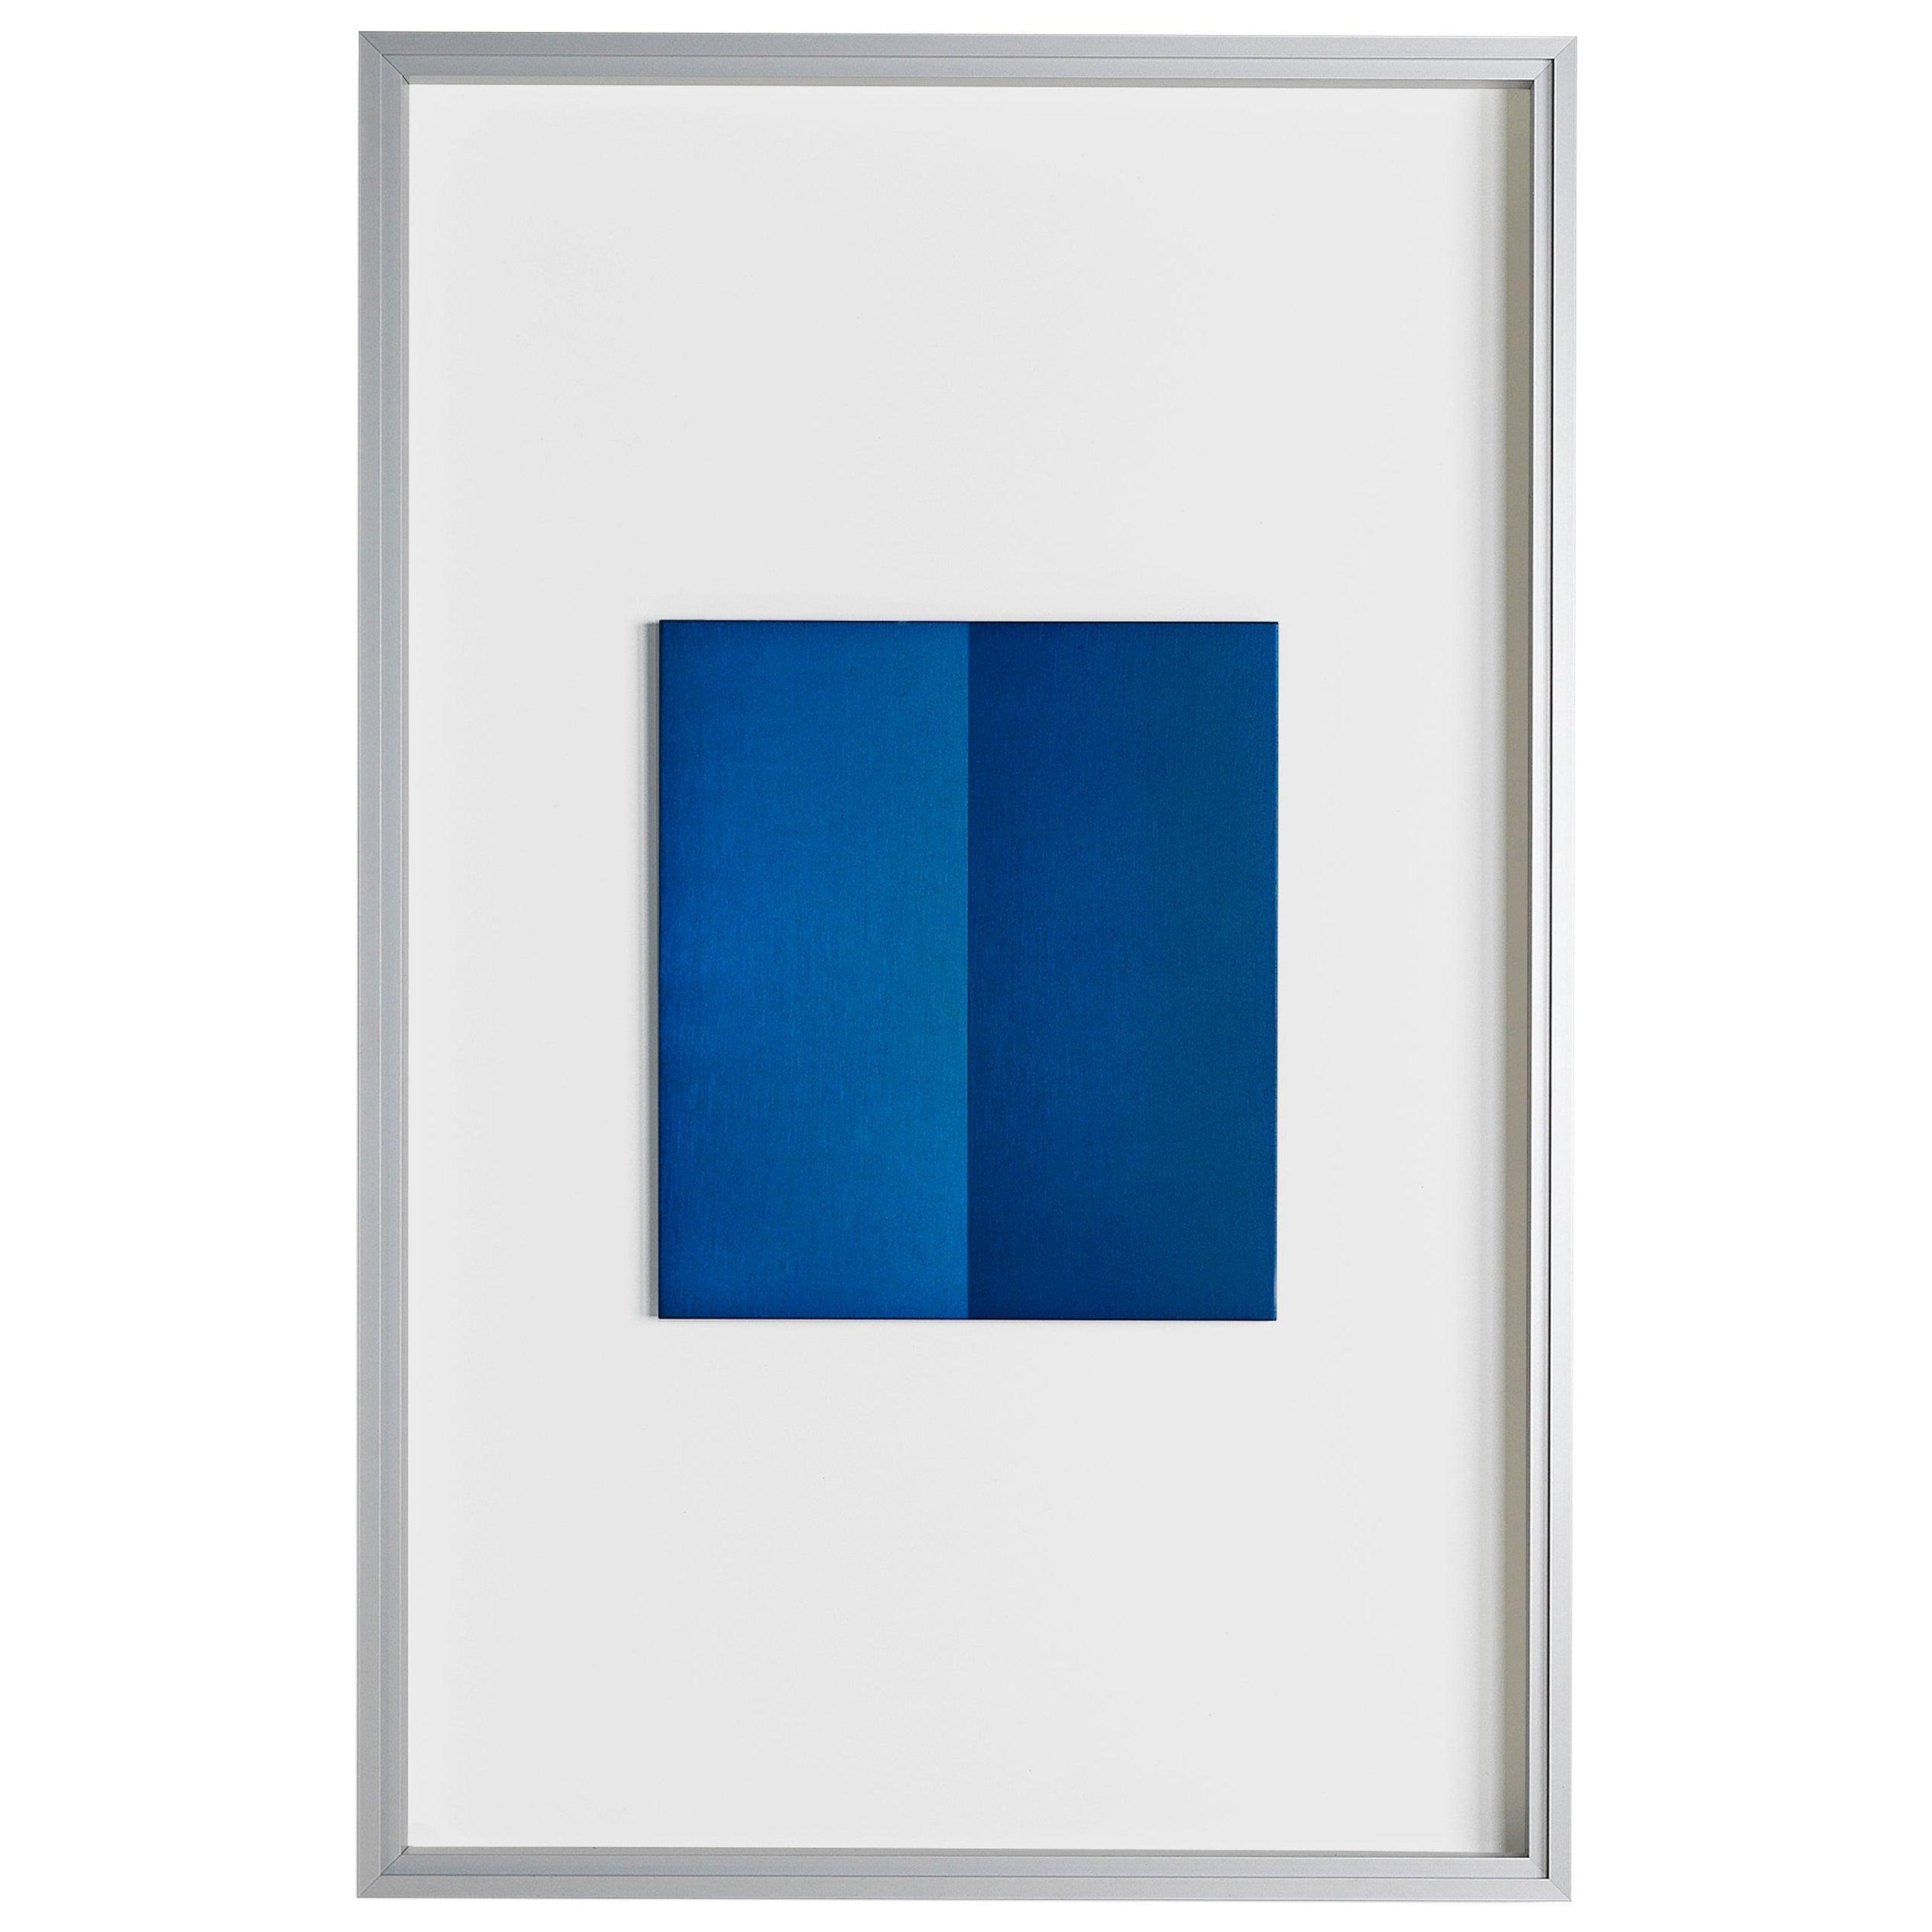 Phenomena, Colors, Keiji Takeuchi, 1st Edition, 2020